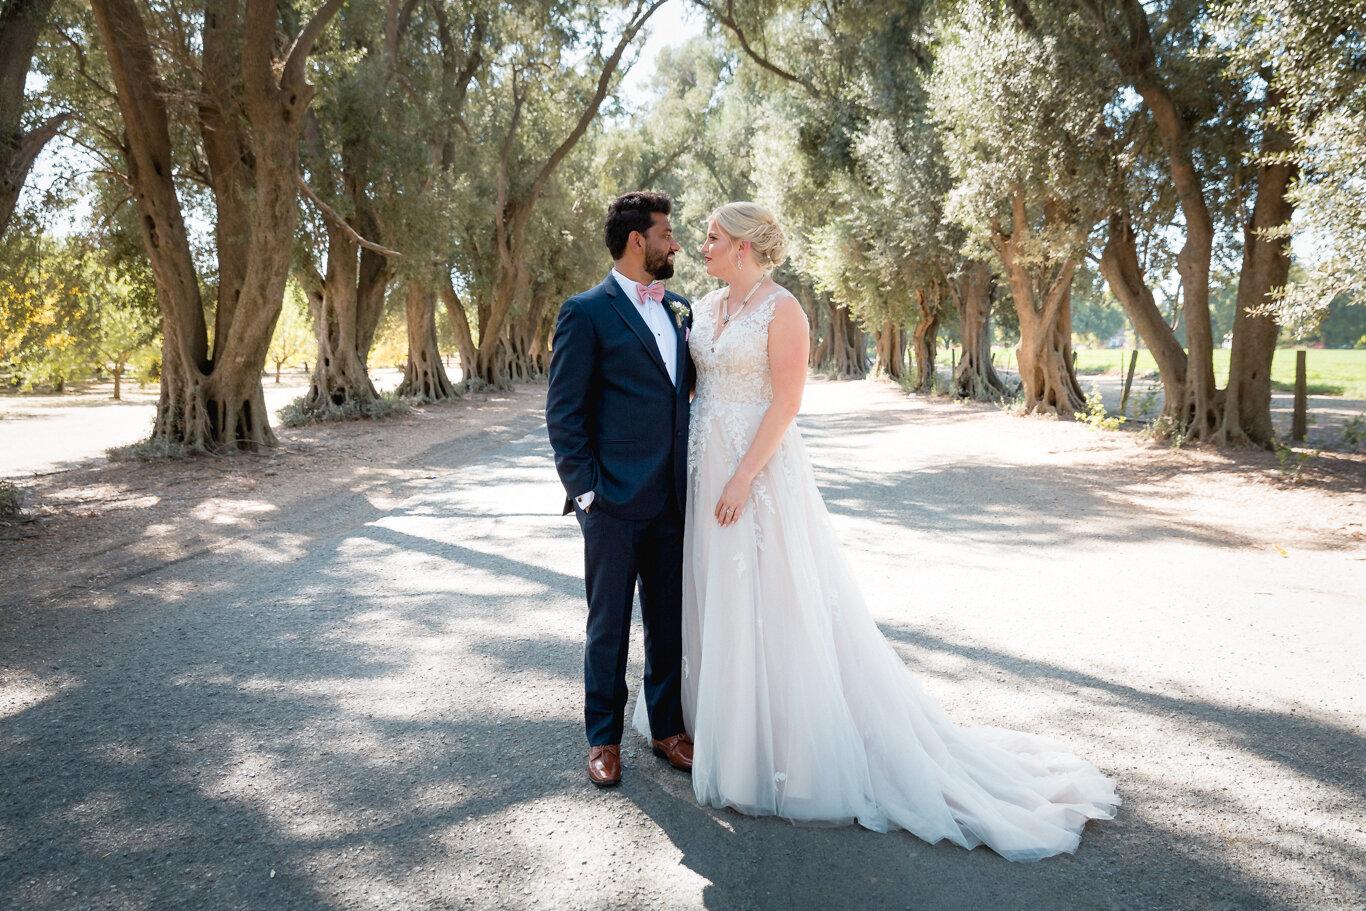 2019.08.24_Emily-Ashir-Wedding-at-the-Maples-5264.jpg